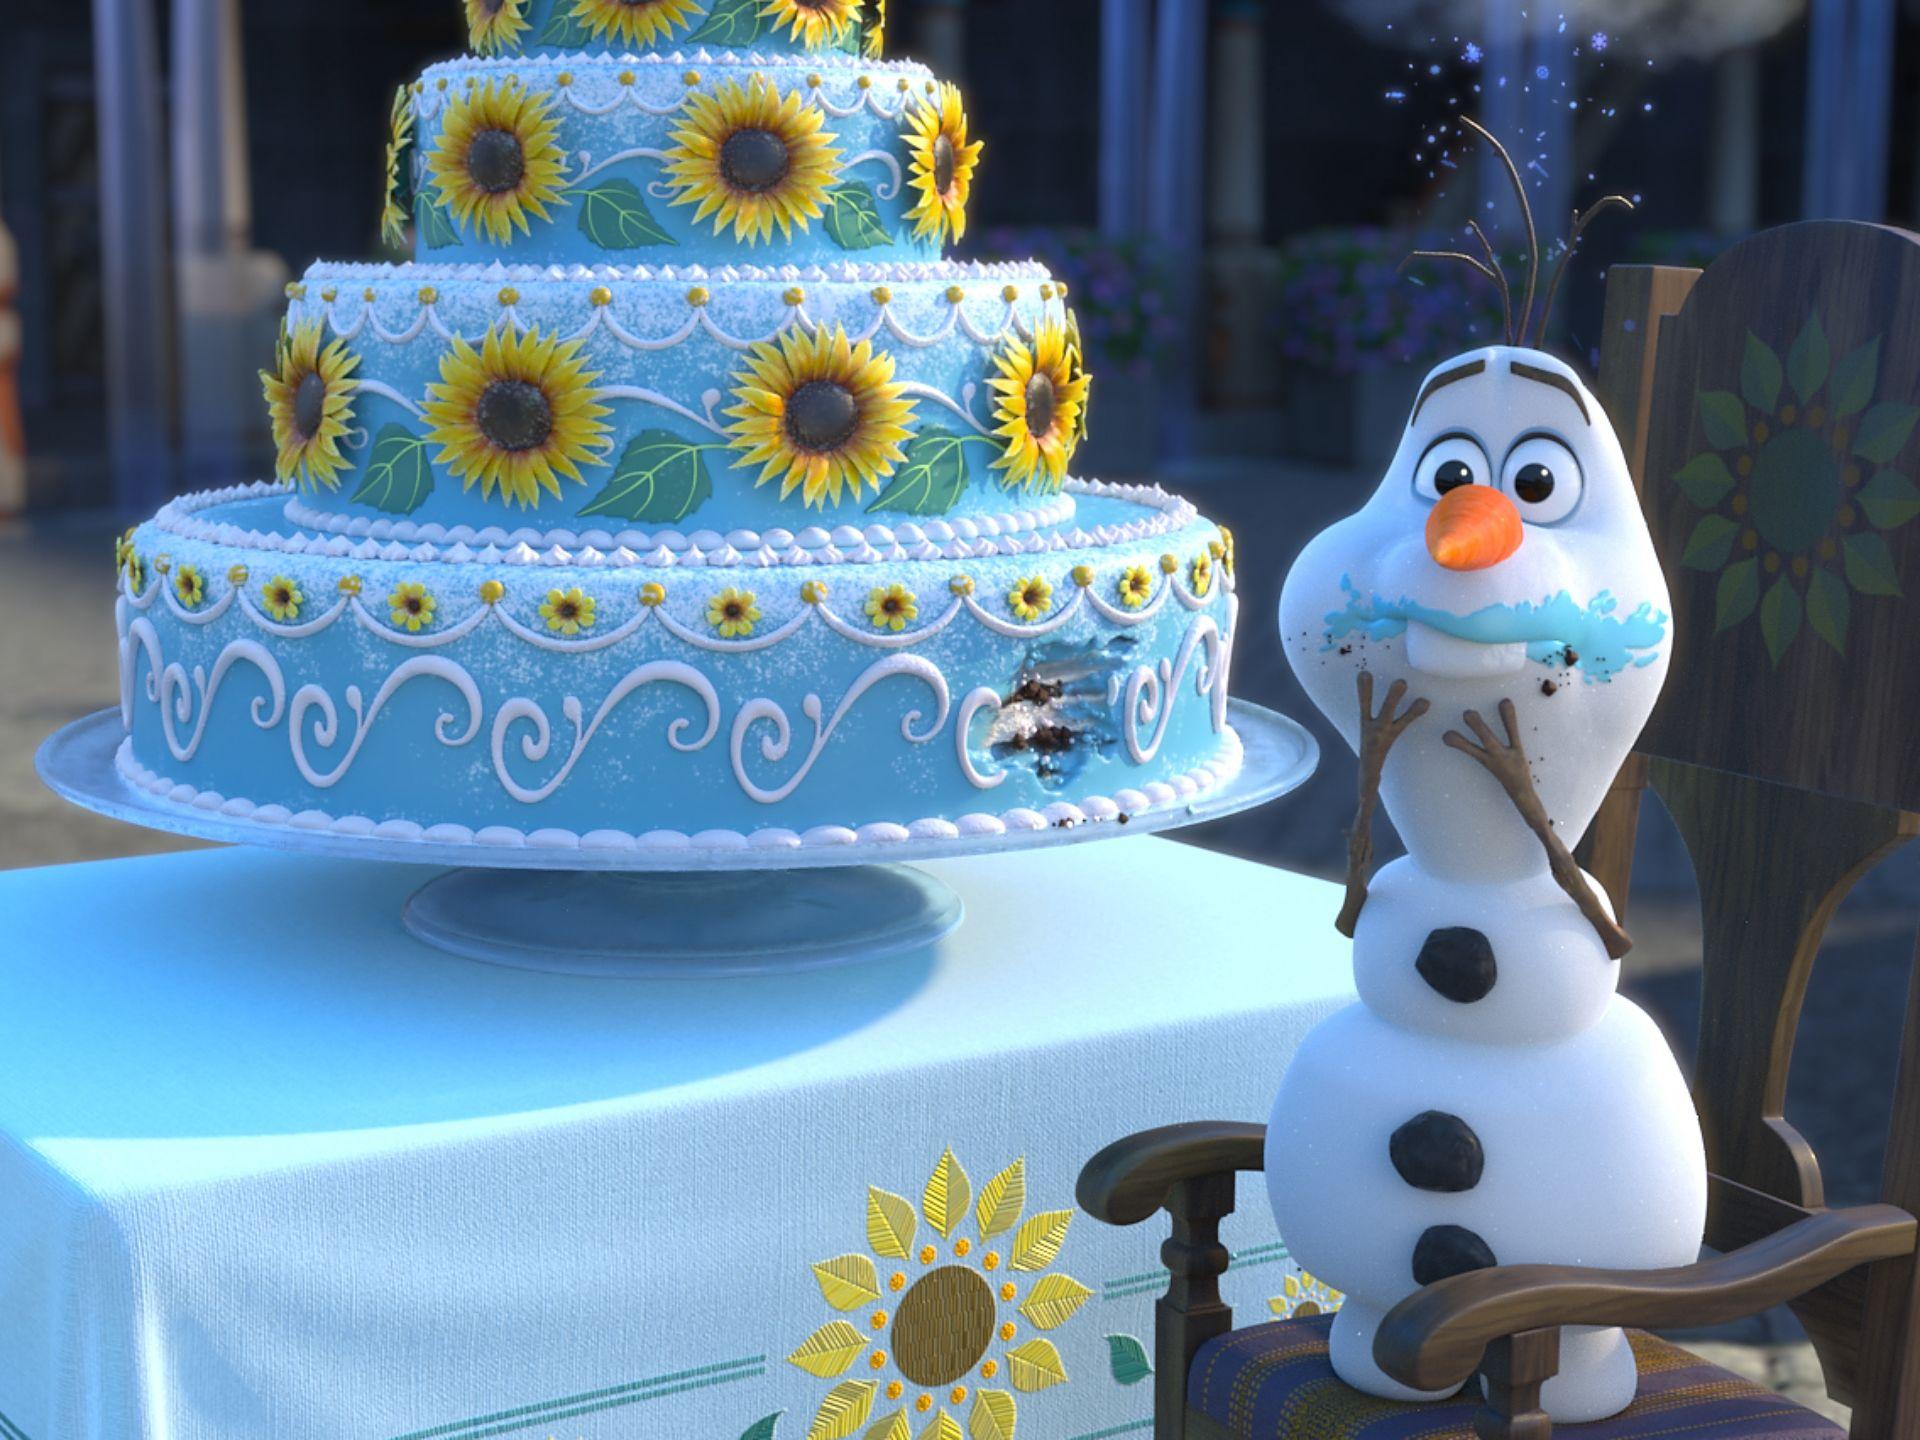 First Look at 'Frozen Fever' Short Film with 5 Stills